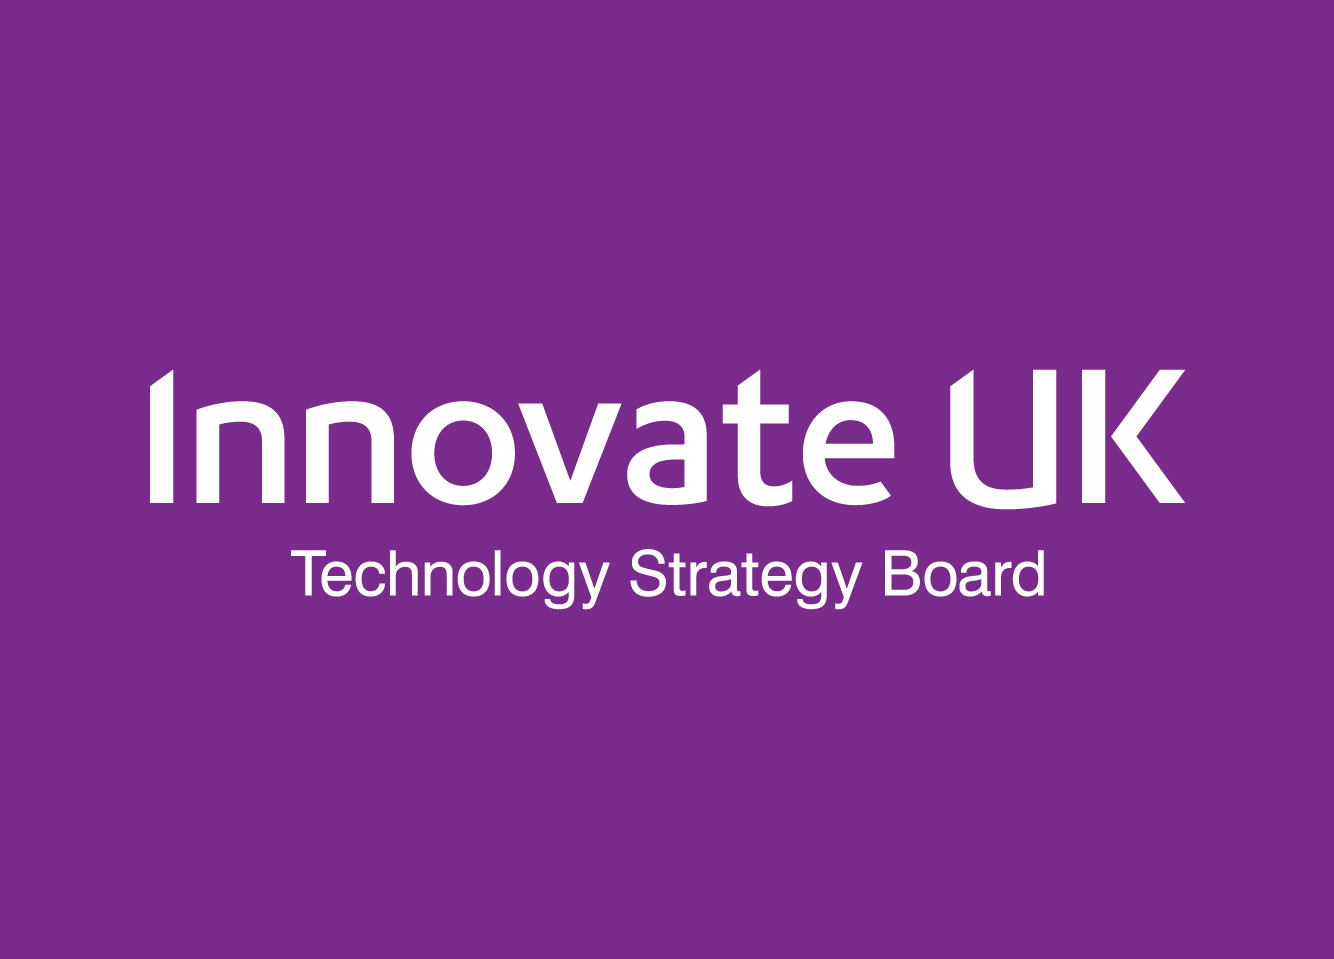 2017/18 Innovate UK priority areas